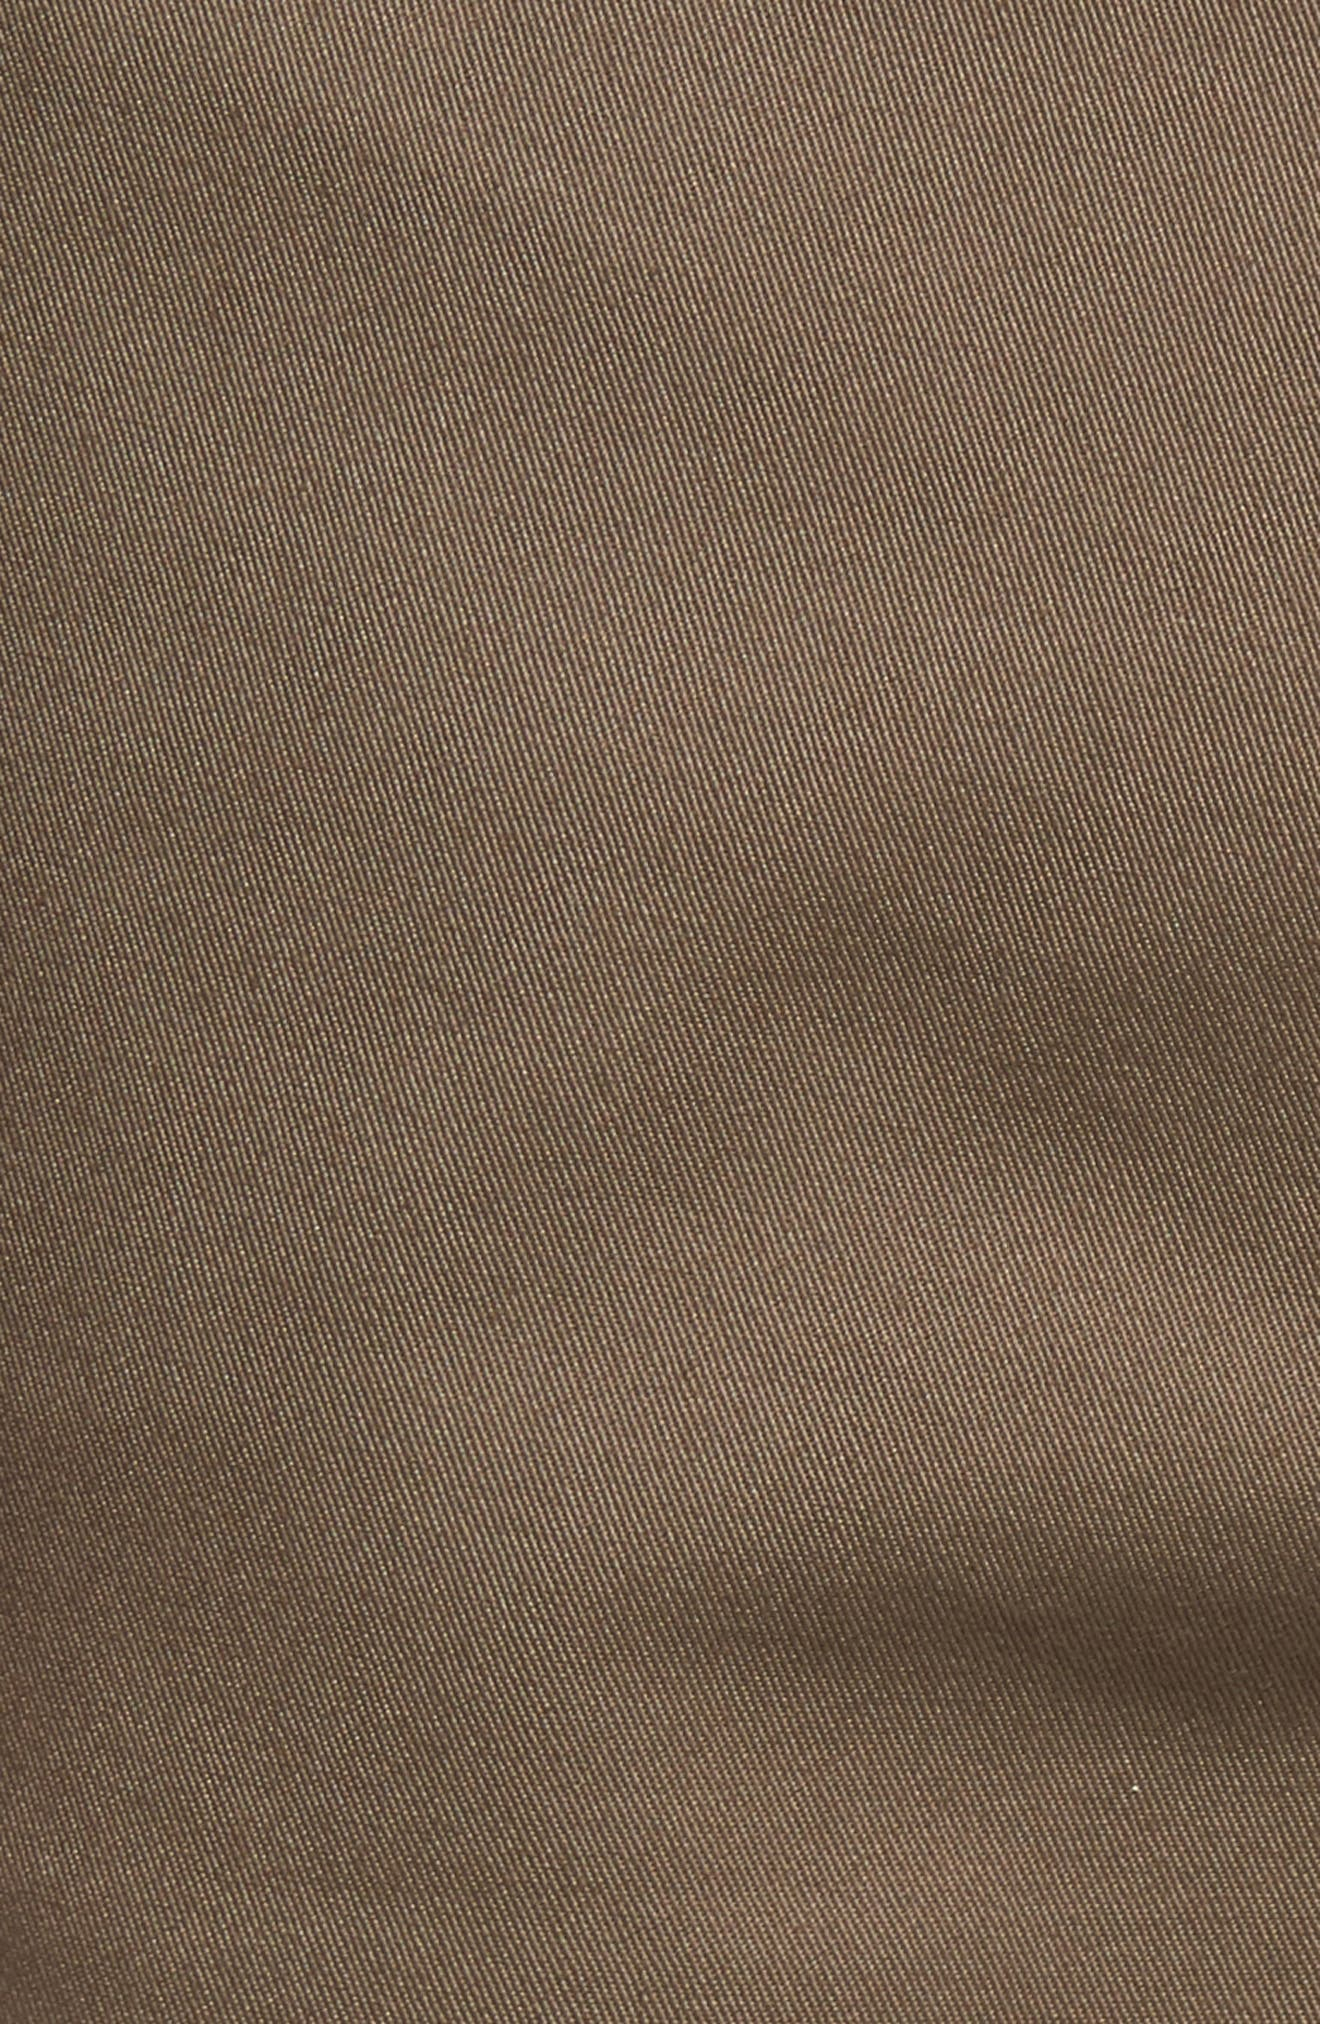 Drifter Modern Chino Shorts,                             Alternate thumbnail 5, color,                             Mushroom